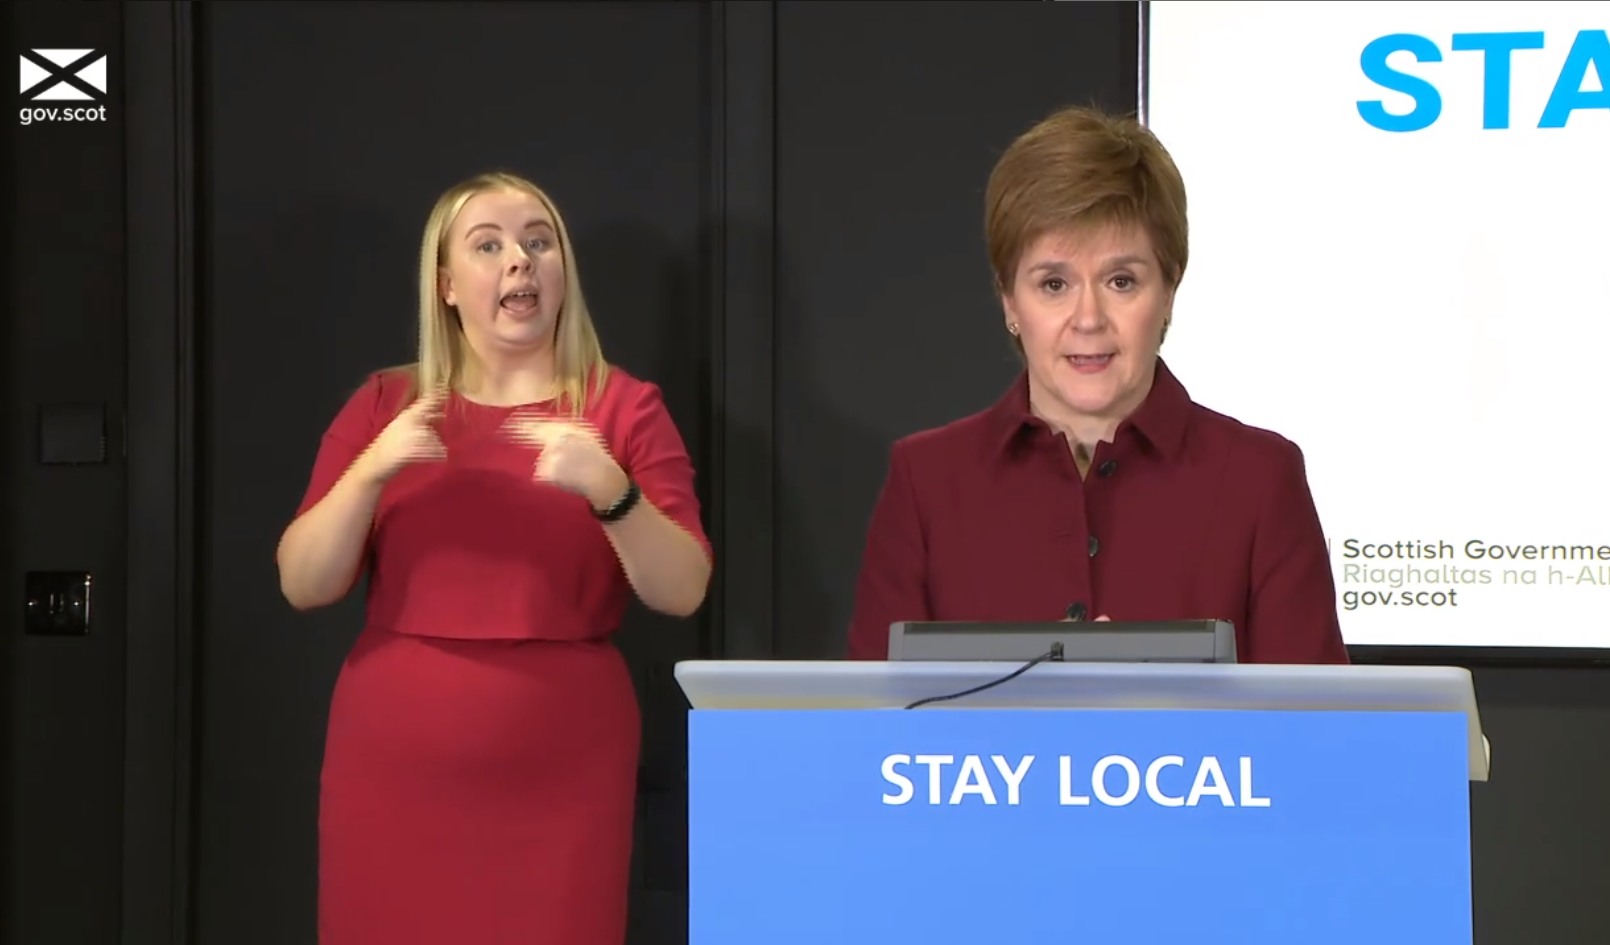 Covid: Nicola Sturgeon urged to pause lockdown easing in Scotland